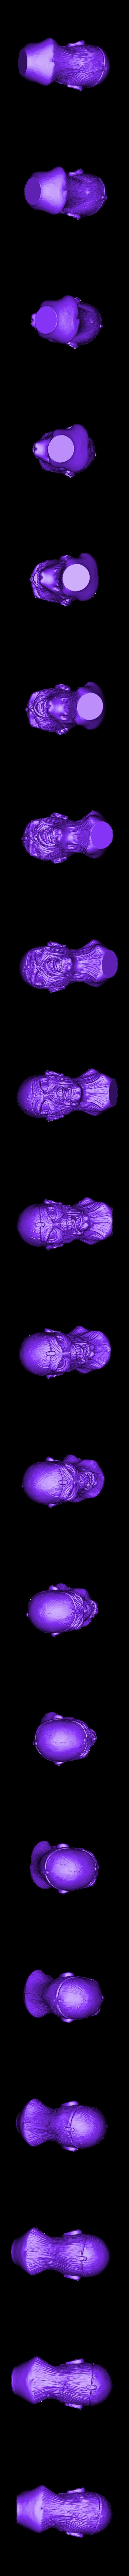 CARETA 2 IRON.stl Download STL file EDDIE IRON MAIDEN • 3D printable template, GUSTAVO